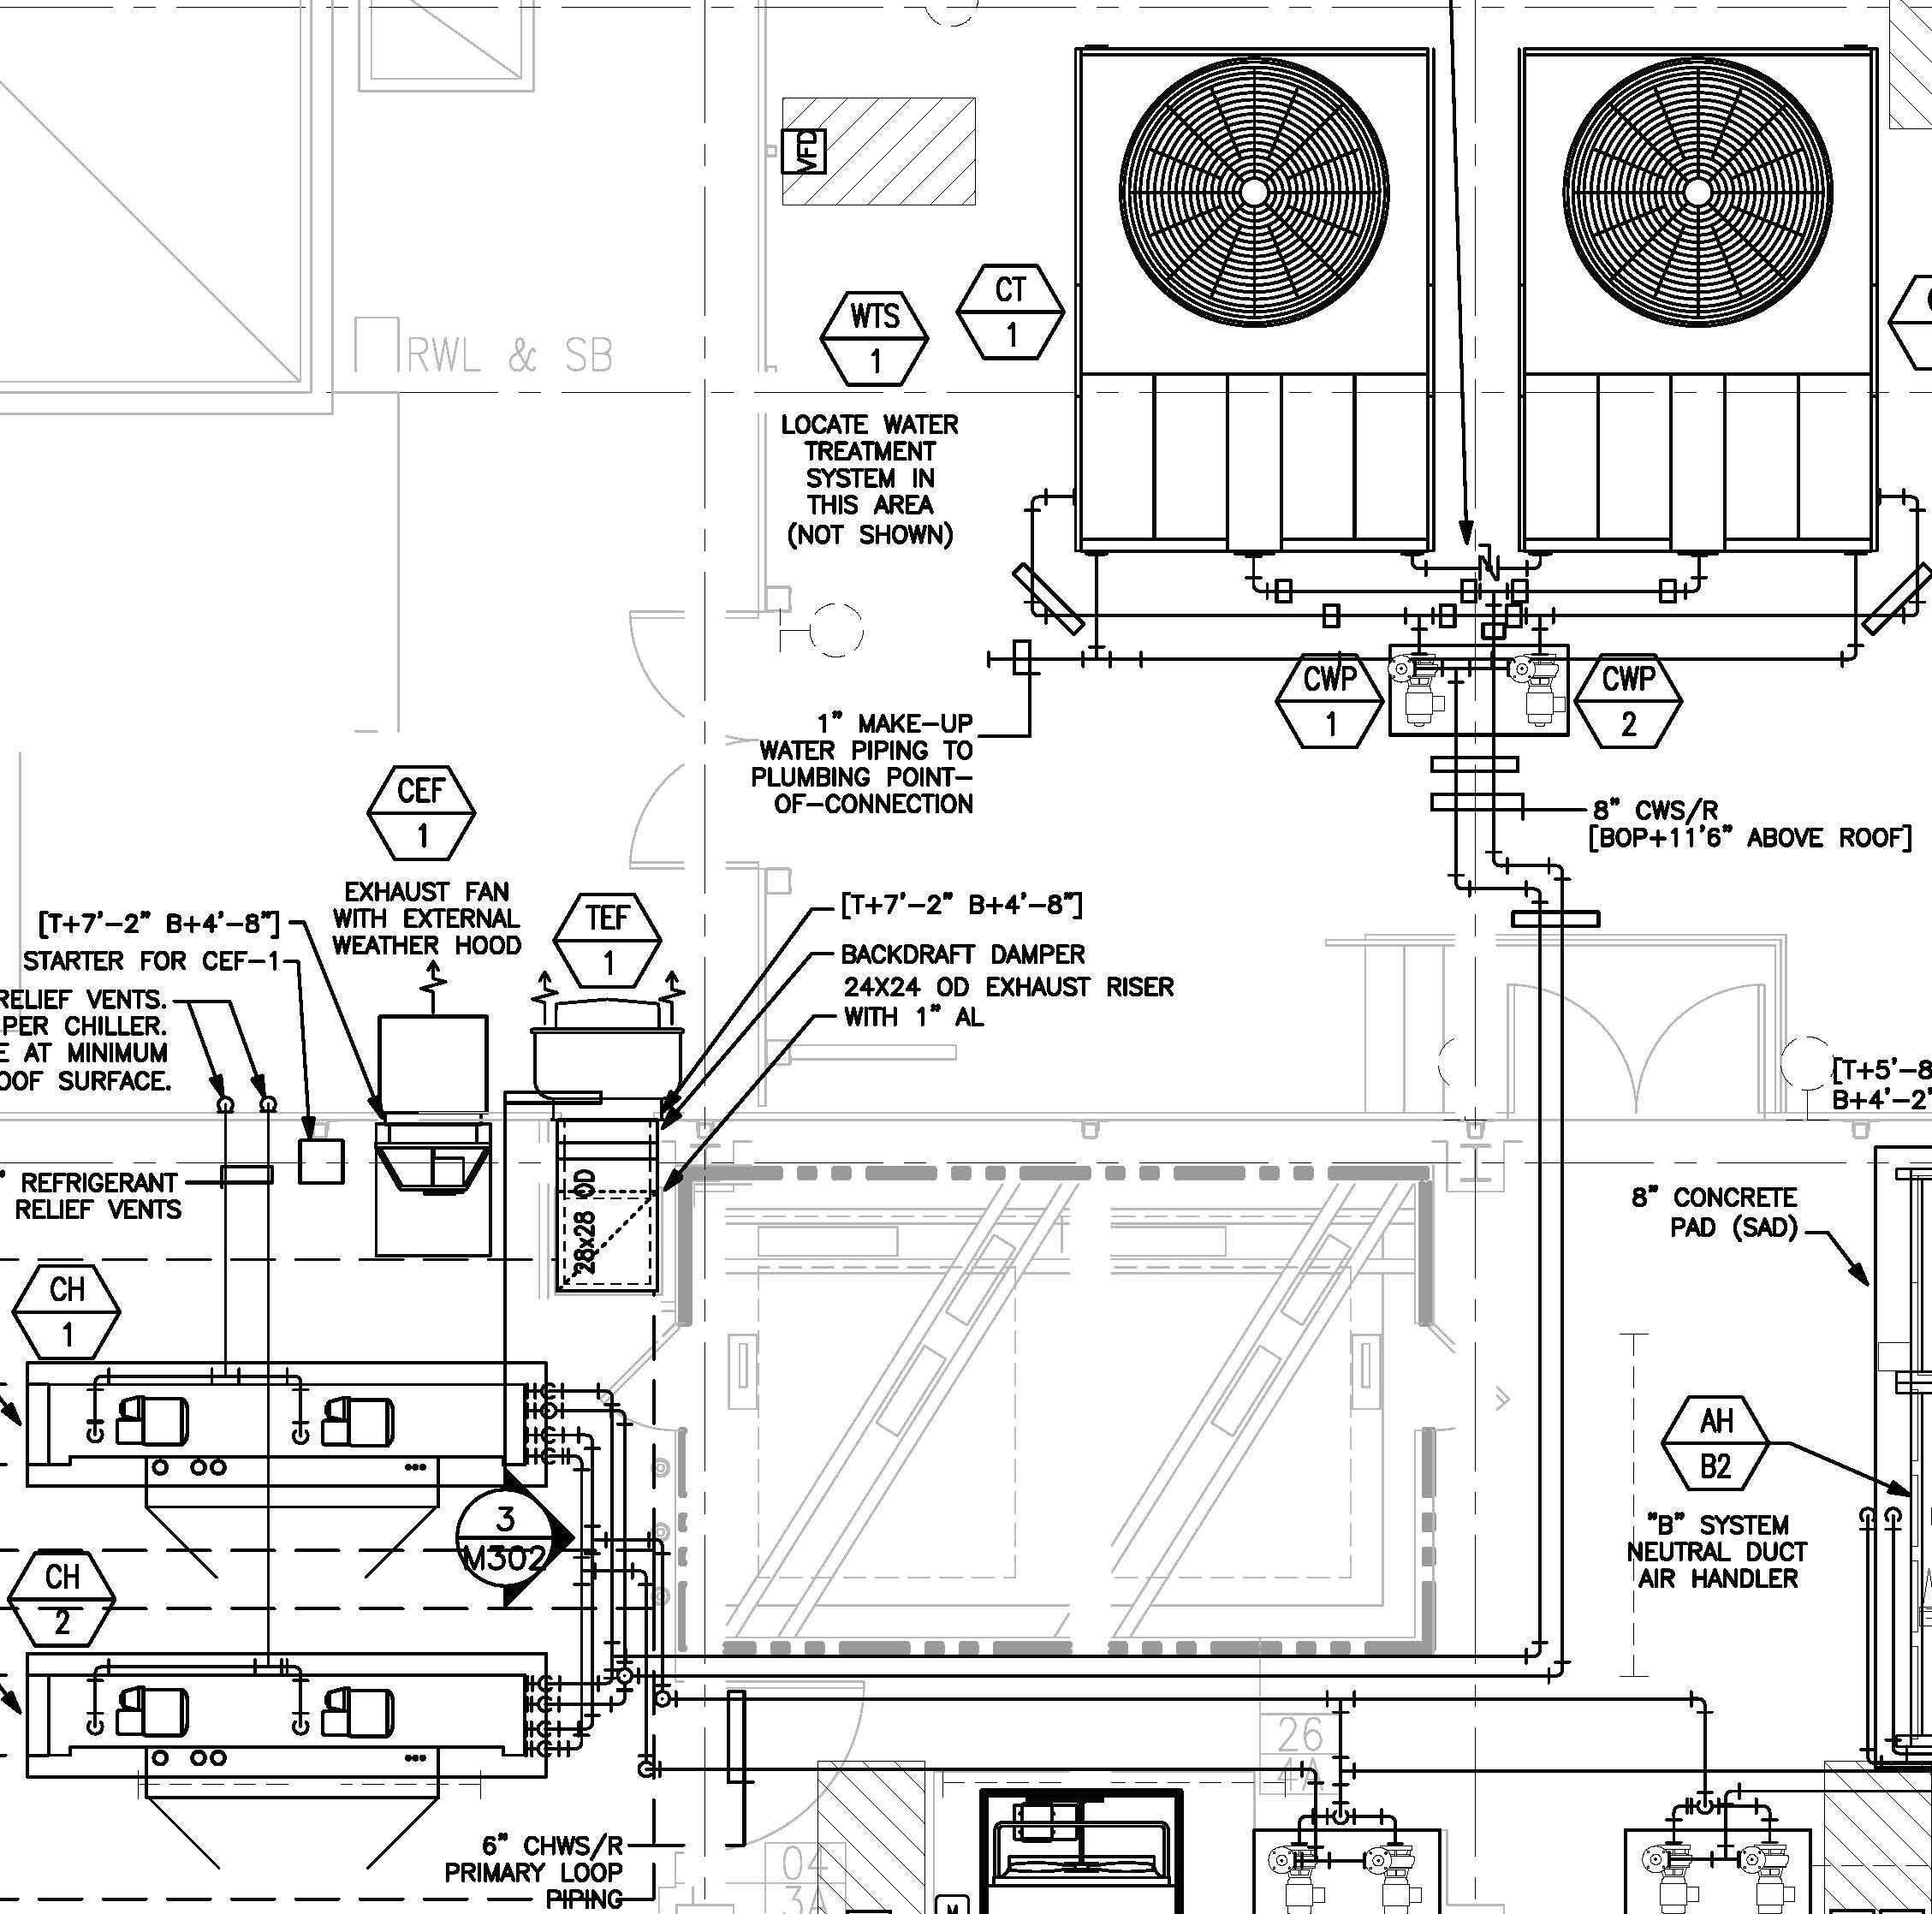 Jeep Cj7 Wiring Diagram Luxury Kirloskar Alternator Wiring Diagram & Denki